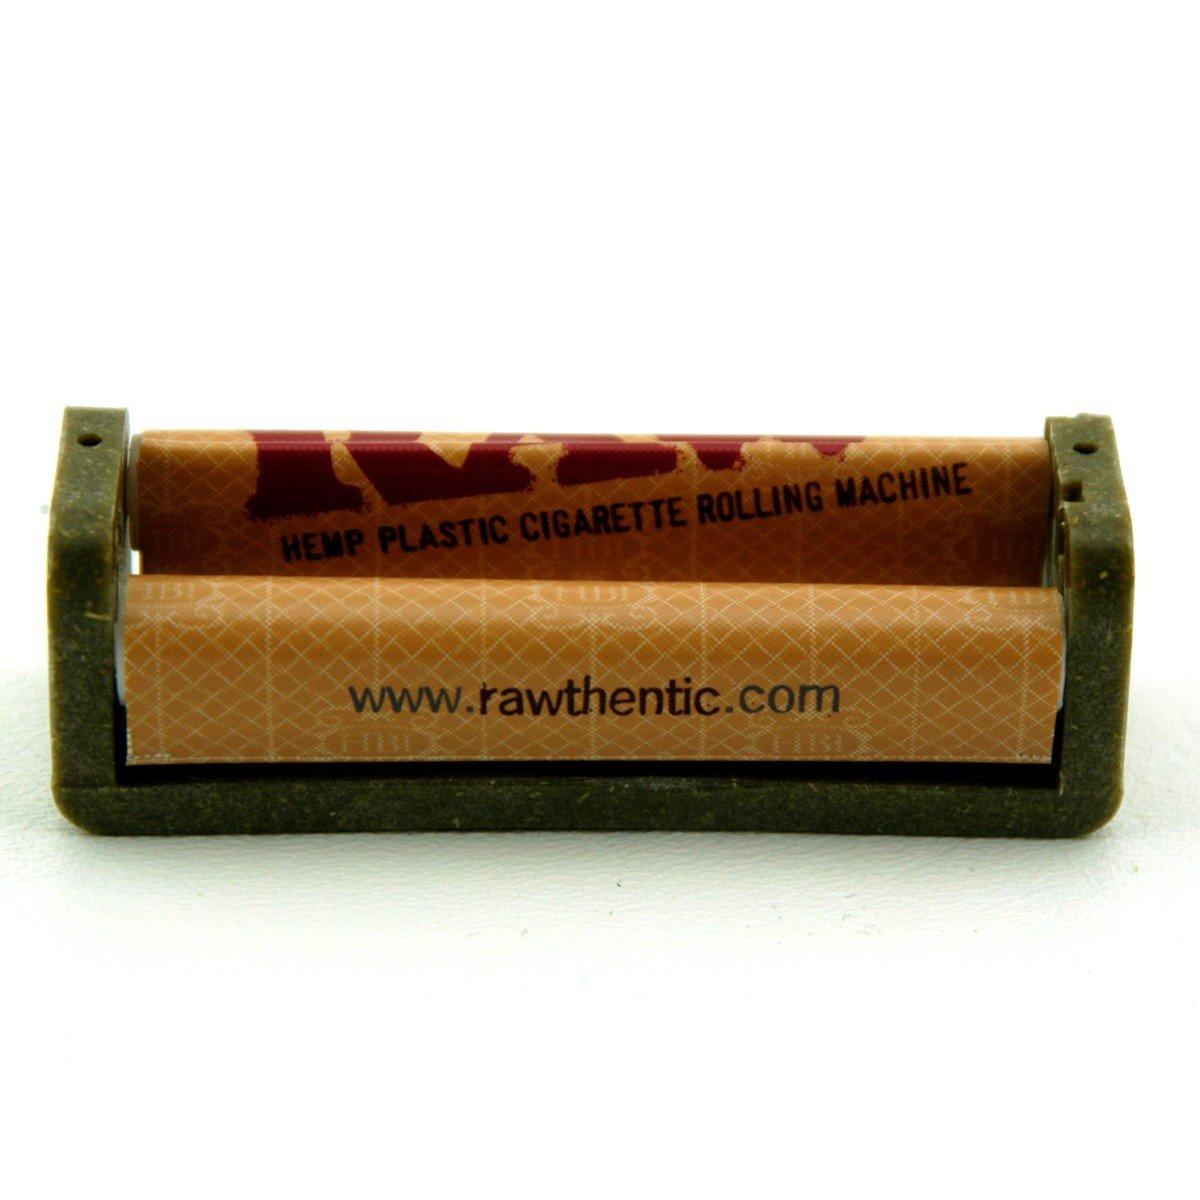 Raw King Size Zigarettenroller mit 4 Raw King Size Zigarettenpapierpäckchen u...